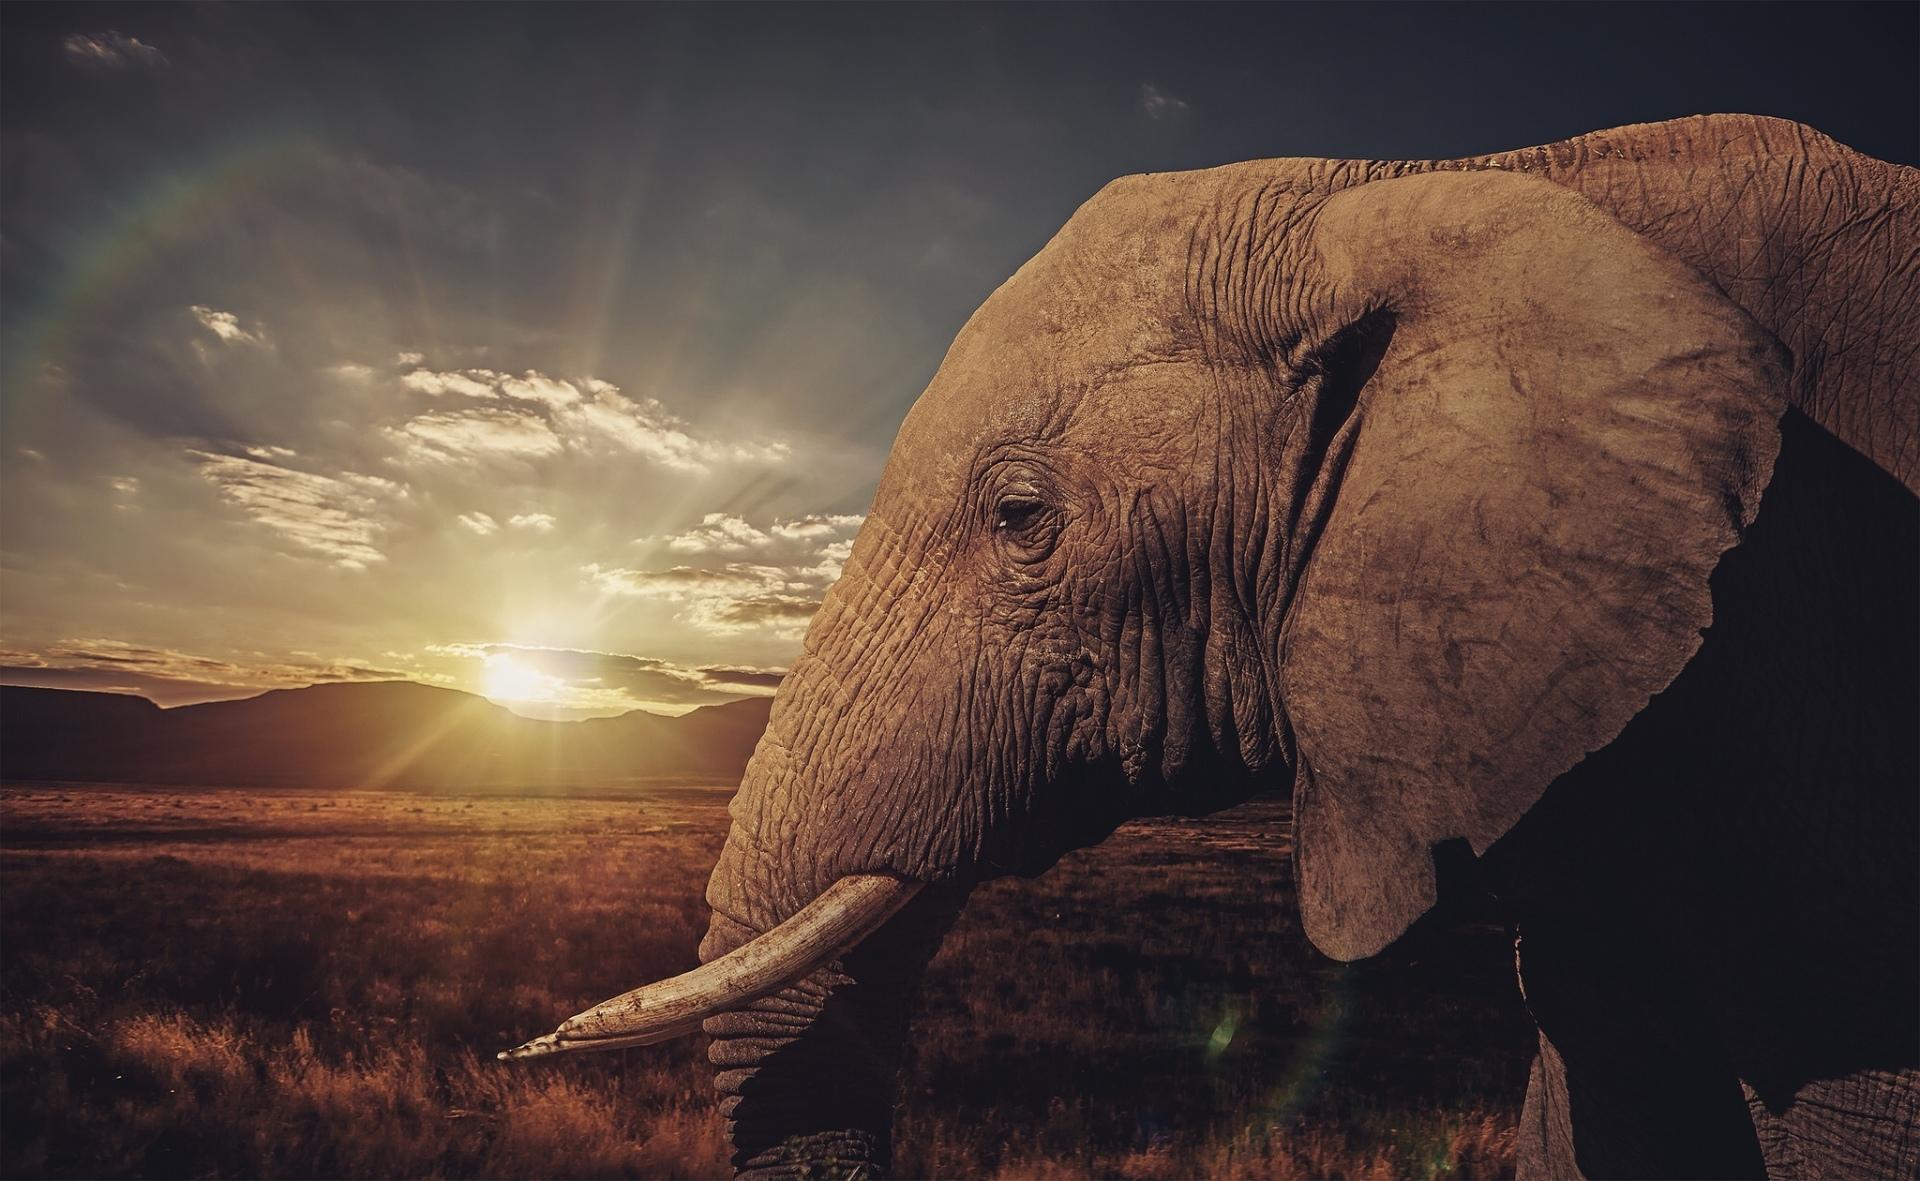 Fondos Para Fotos Hd: Fondos De Pantalla De Elefantes, Wallpapers HD Para